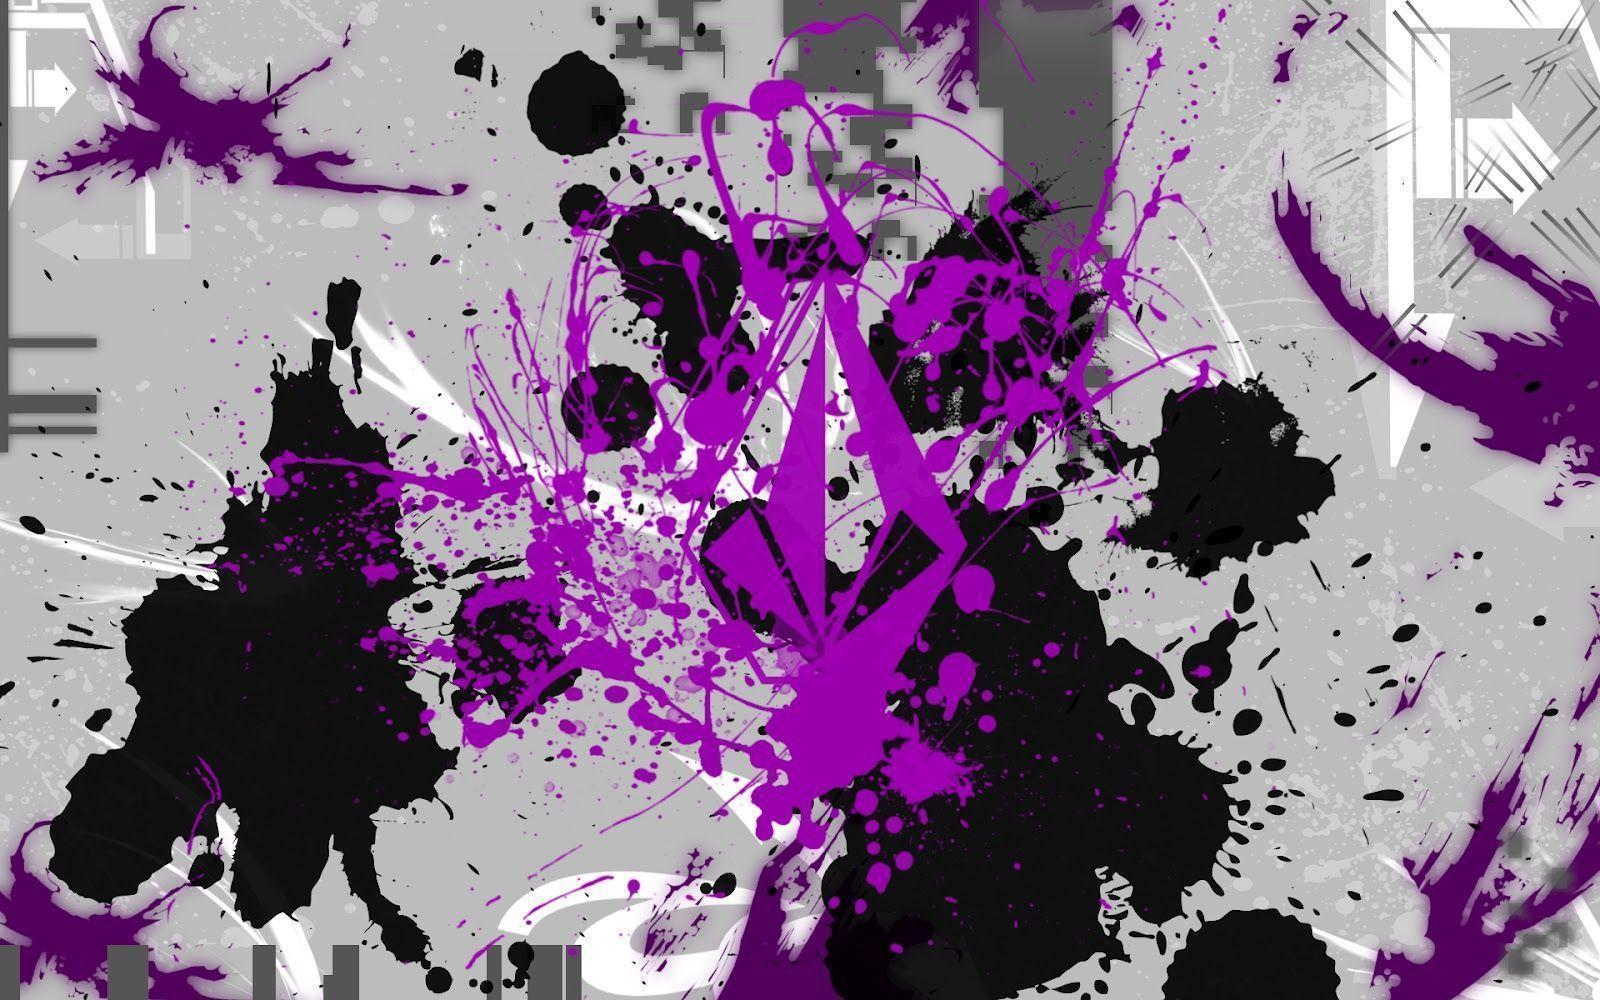 Paint Splatter Desktop Wallpaper Splatter Paint Wallpaper ...